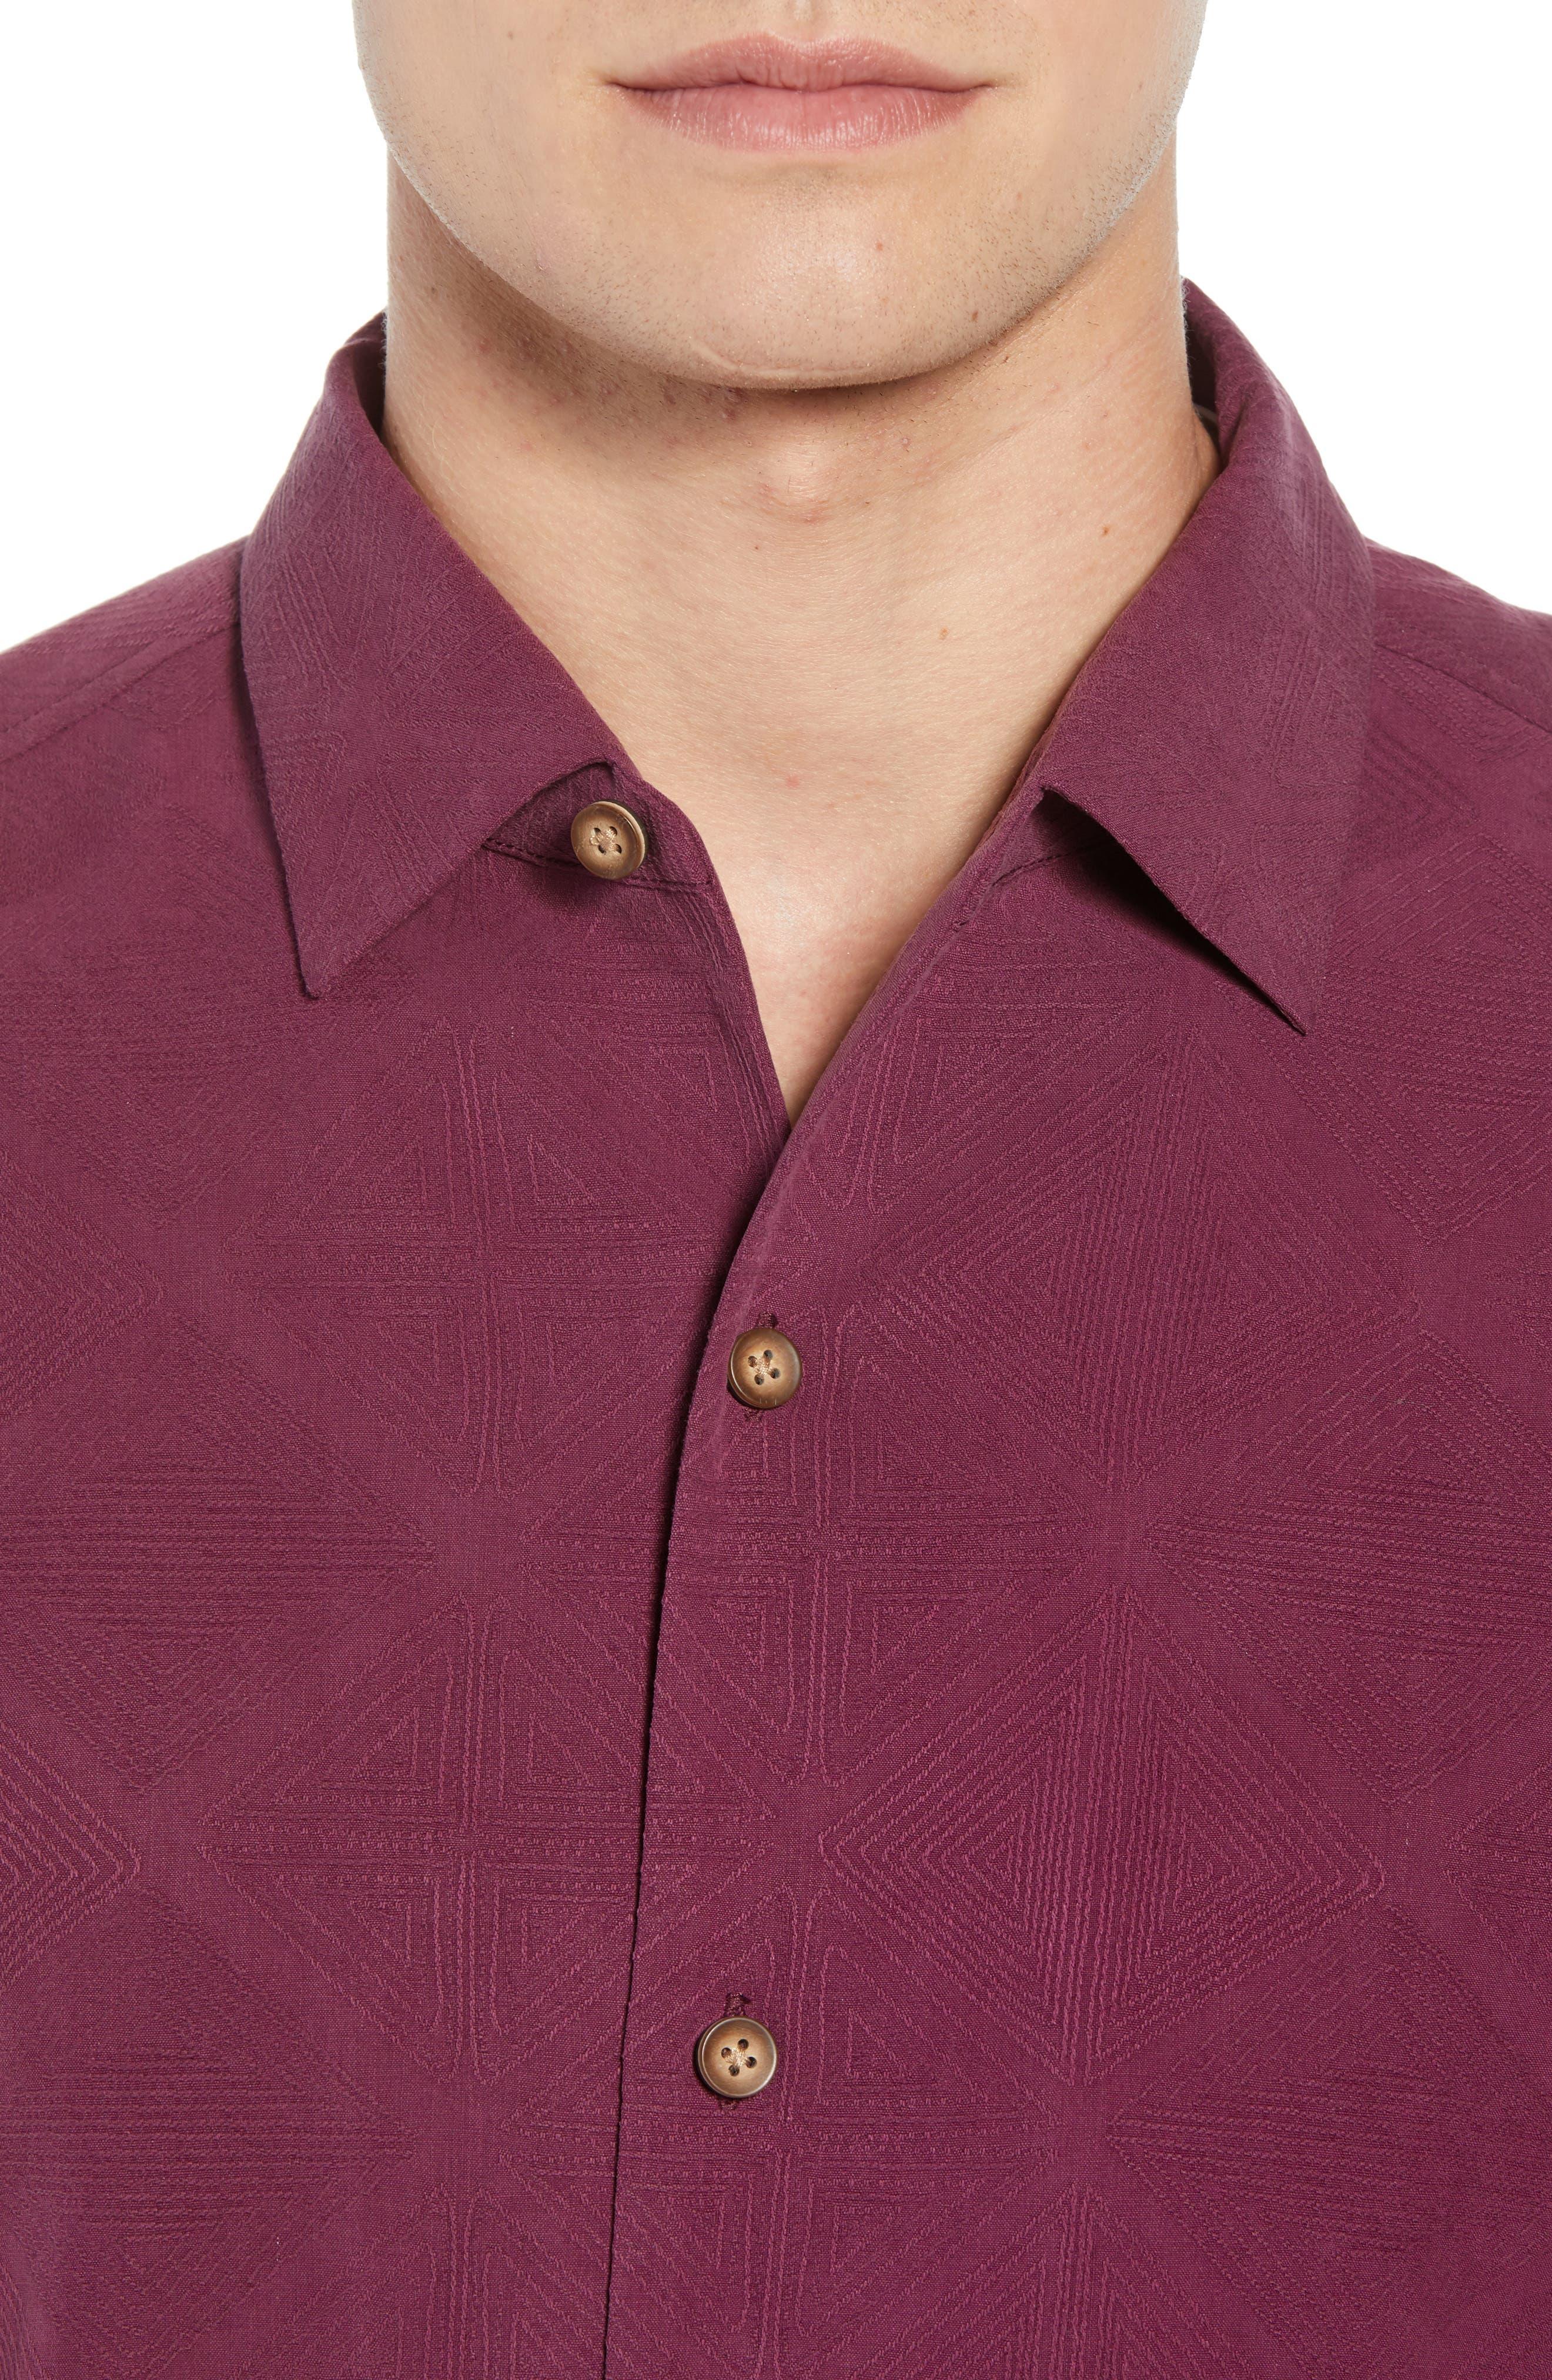 Pura Vino Embroidered Silk Sport Shirt,                             Alternate thumbnail 4, color,                             GRAPE WINE